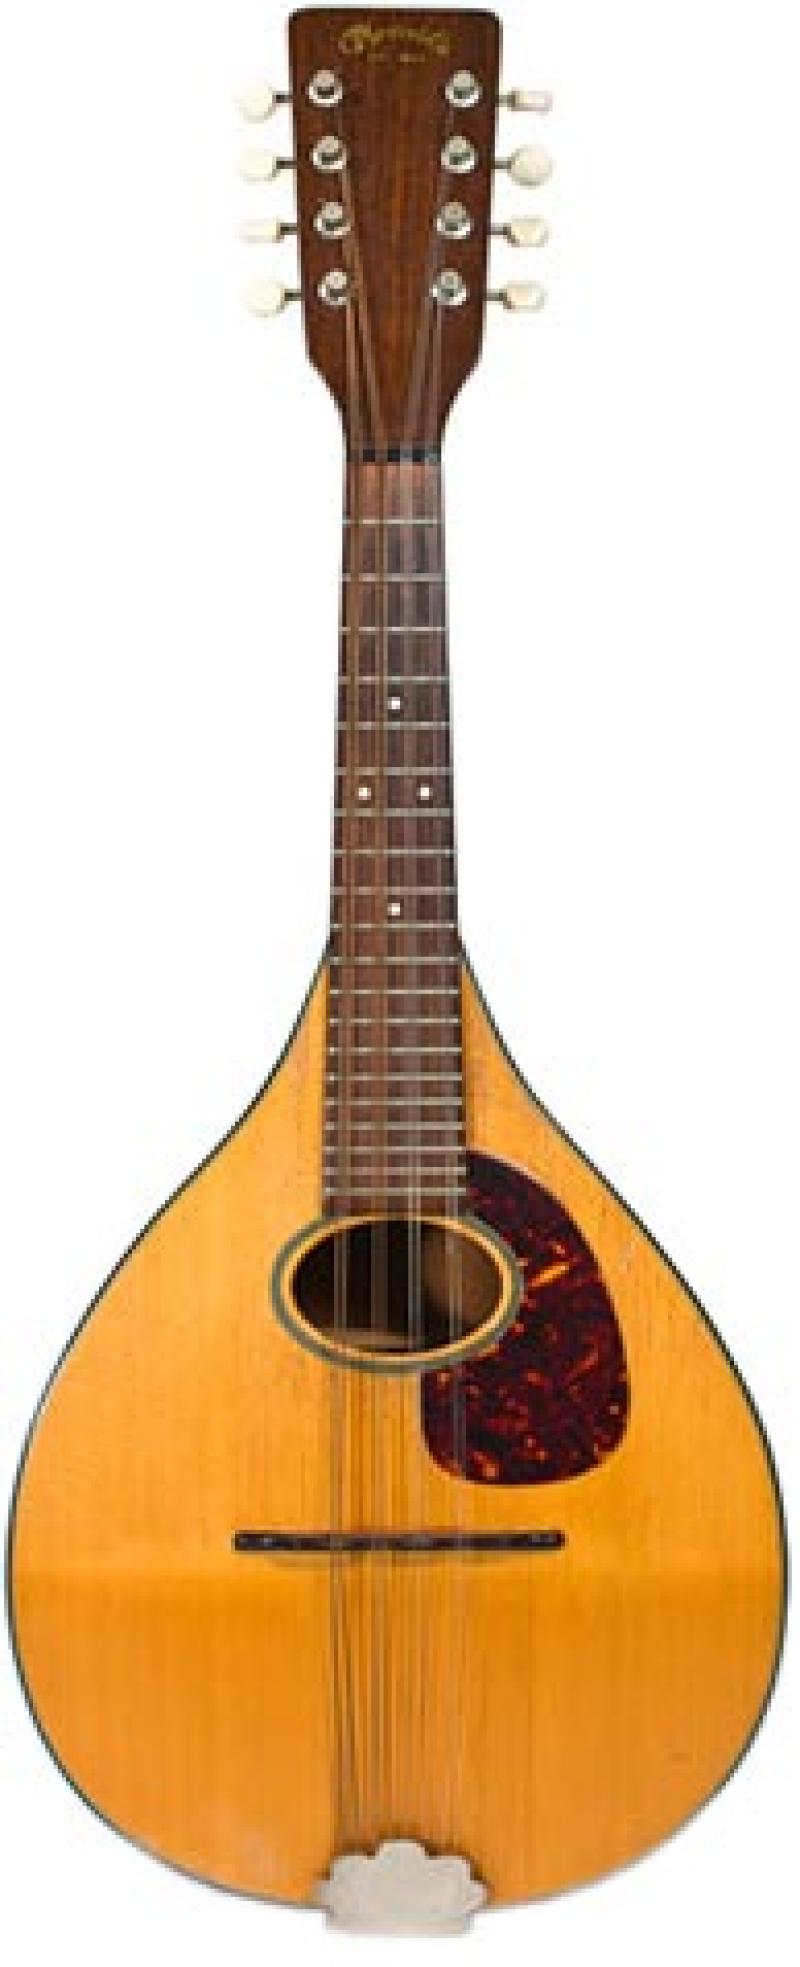 Martin mandolin scaled